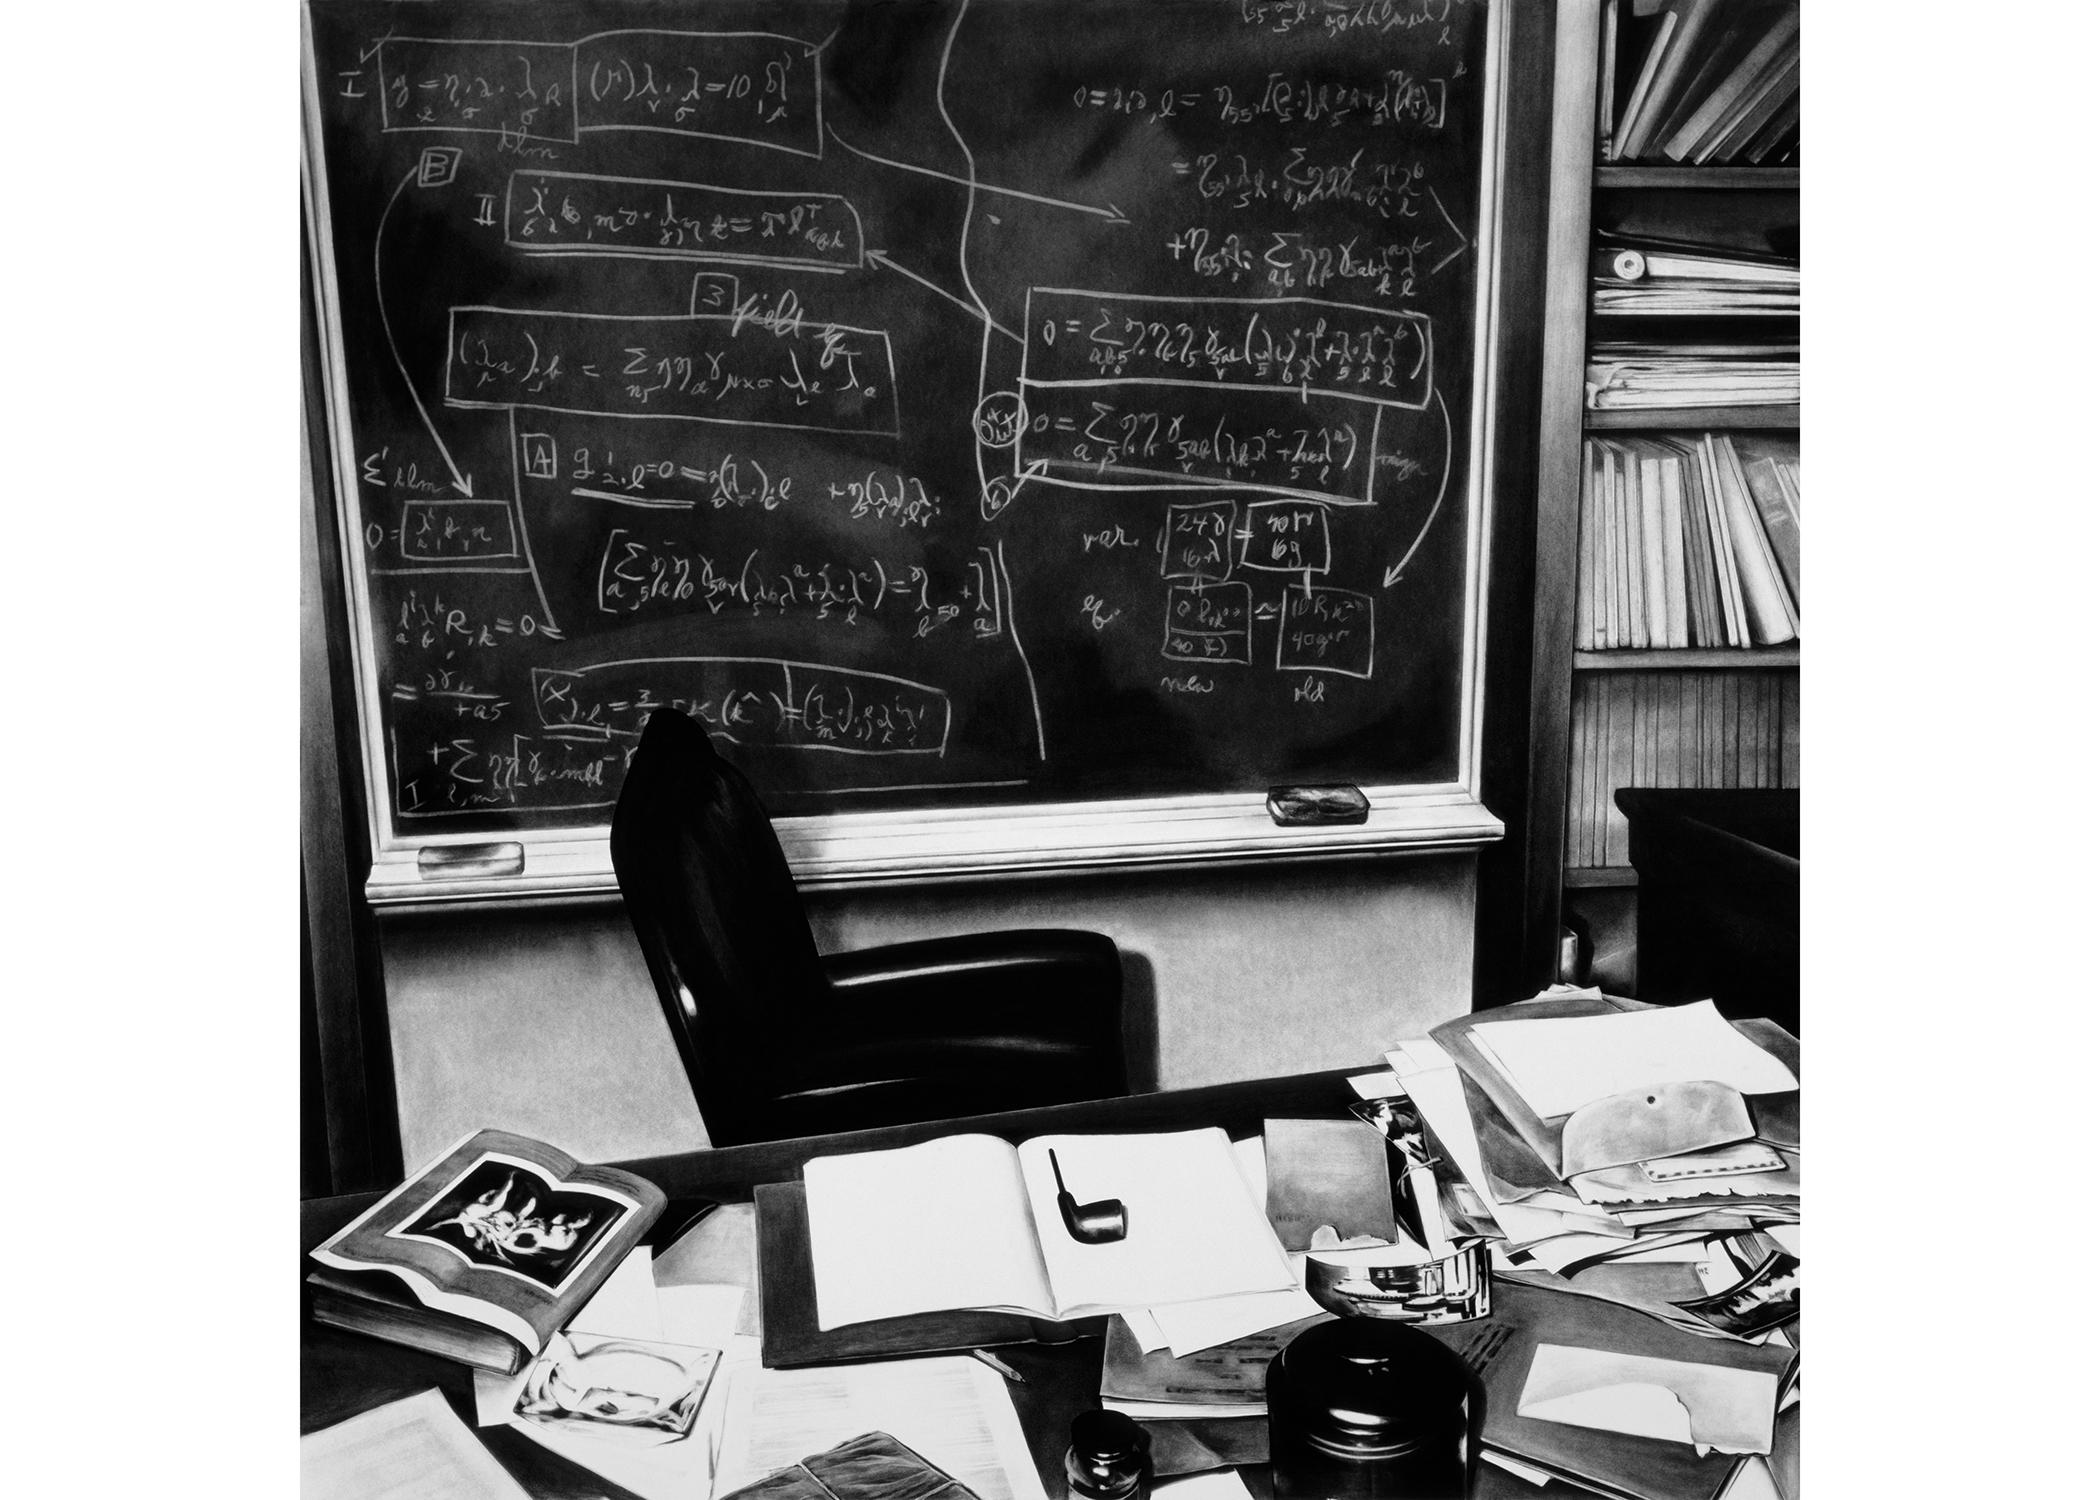 Image Above: ©Robert Longo, 'Einstein's Deks (Princeton),' 2004 / Courtesy of the Artist